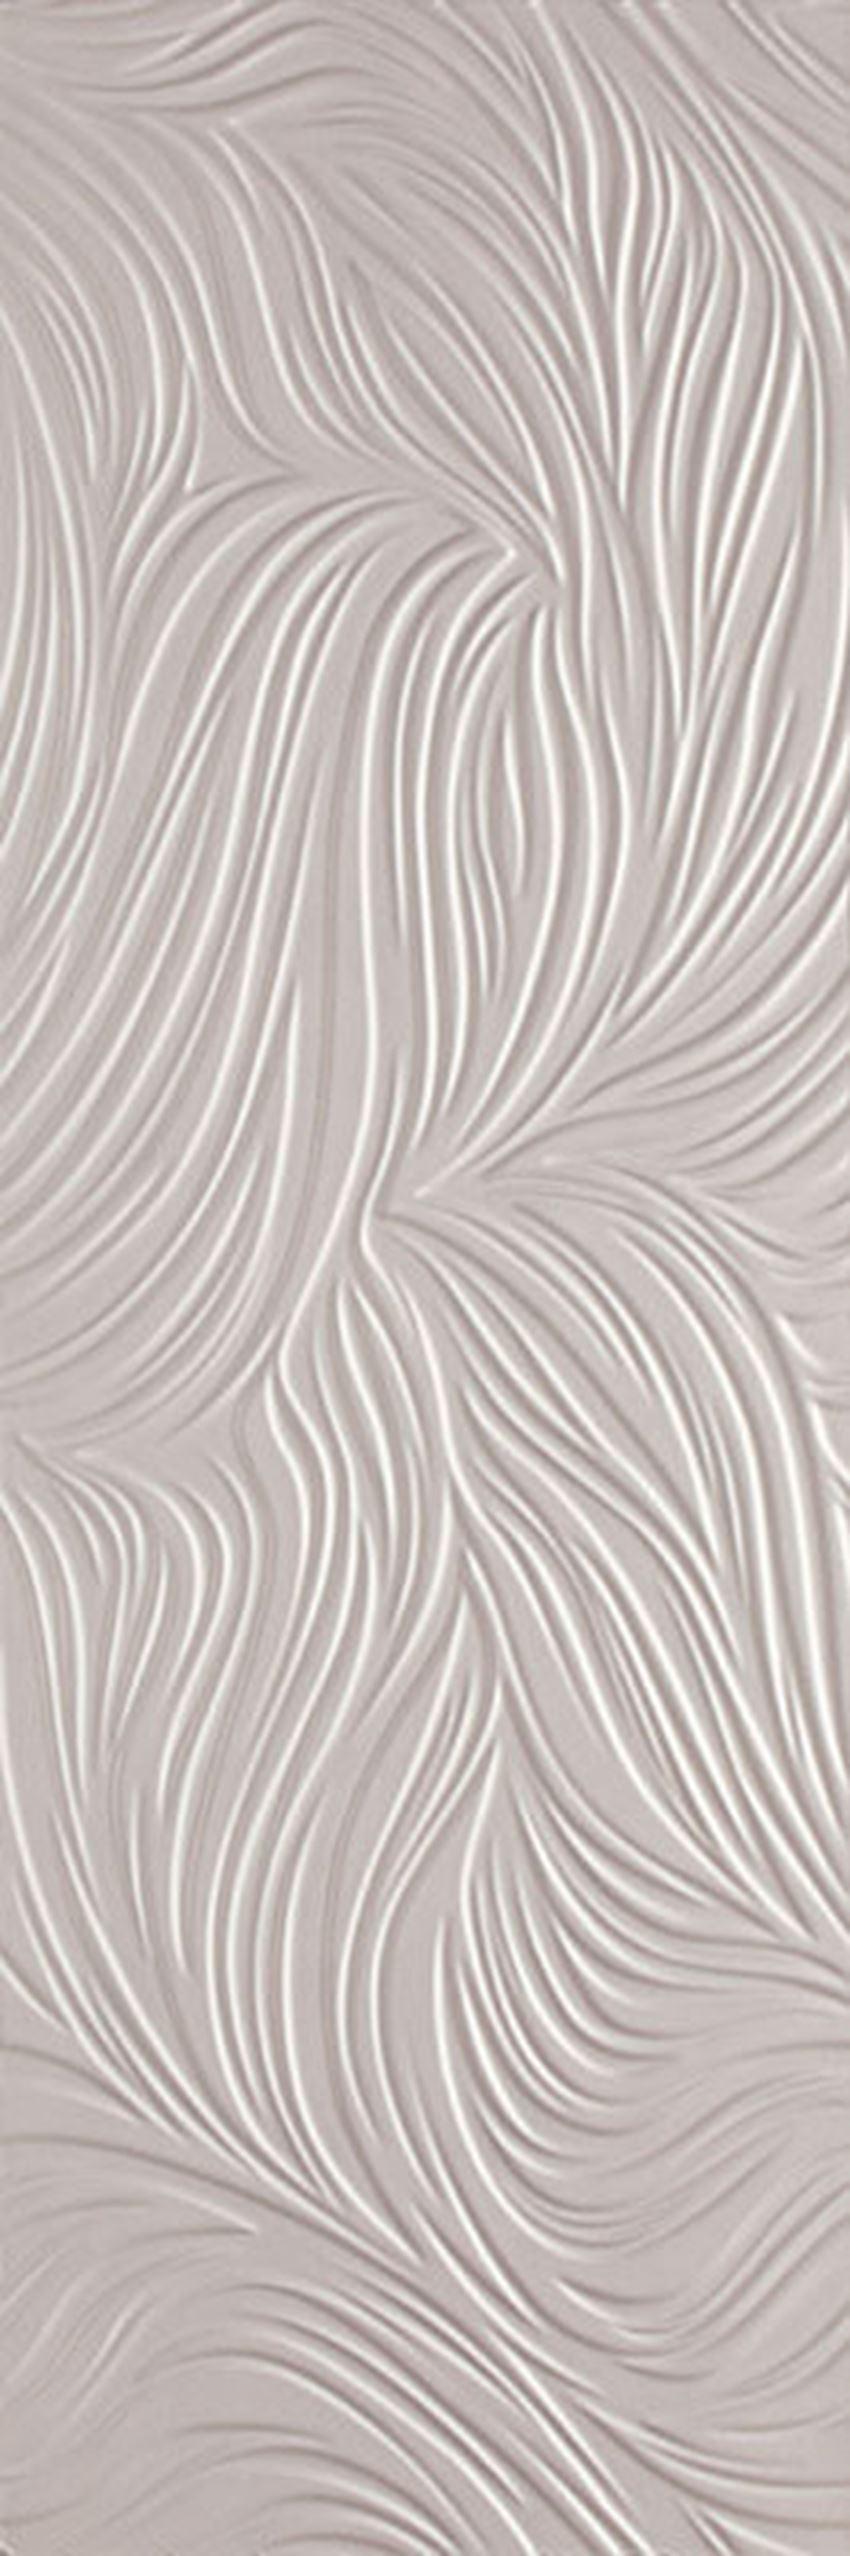 Płytka dekoracyjna 29,8x89,8 cm Paradyż Elegant Surface Silver Inserto Struktura A